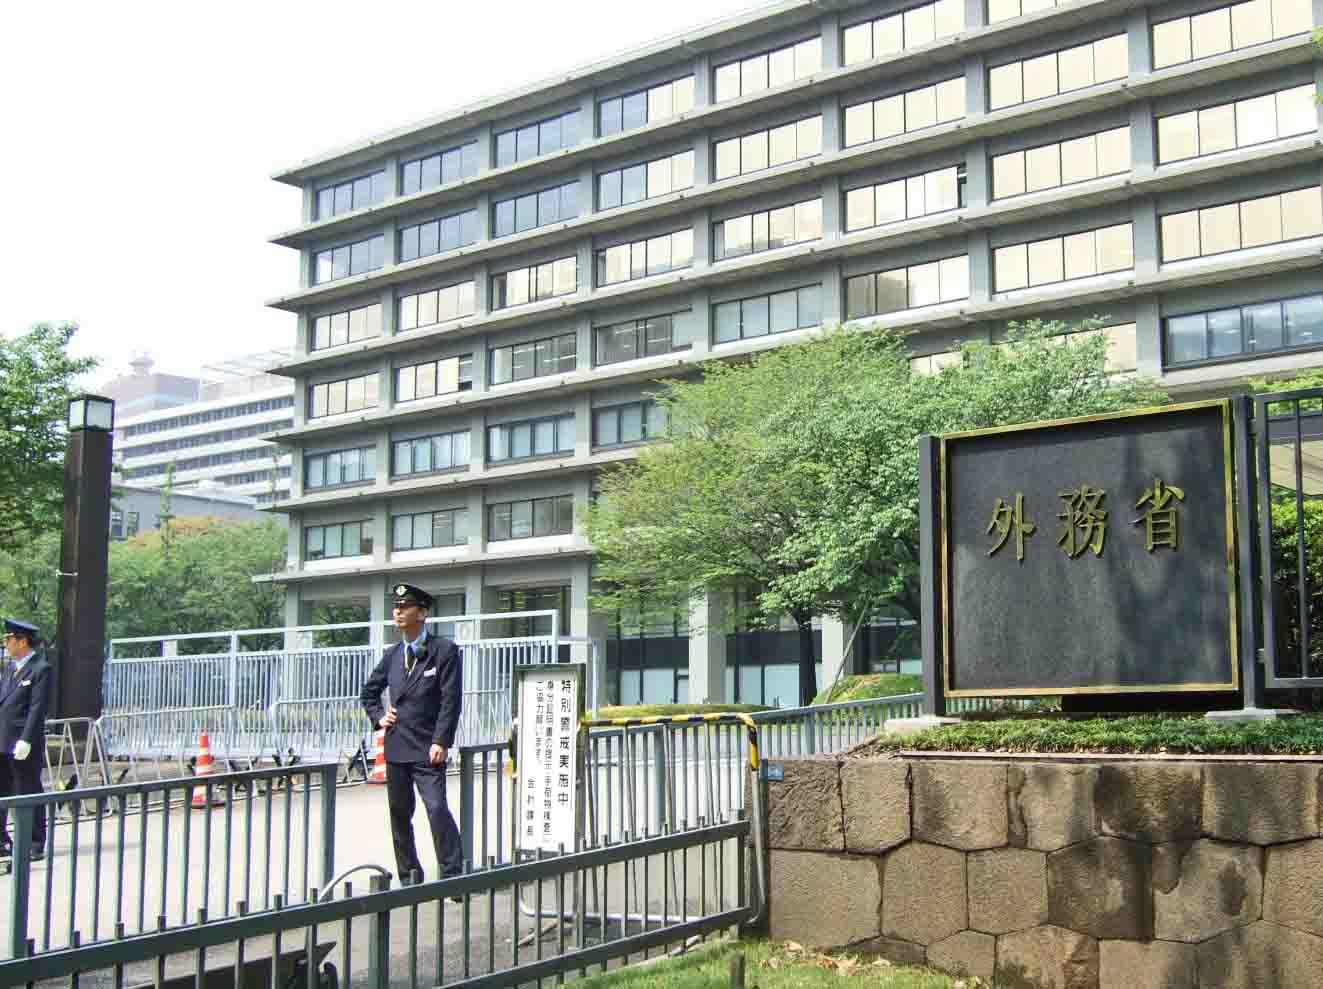 NAVER まとめ【大丈夫?】中国「百度」の日本語文字入力ソフト 無断で入力情報を外部に送信